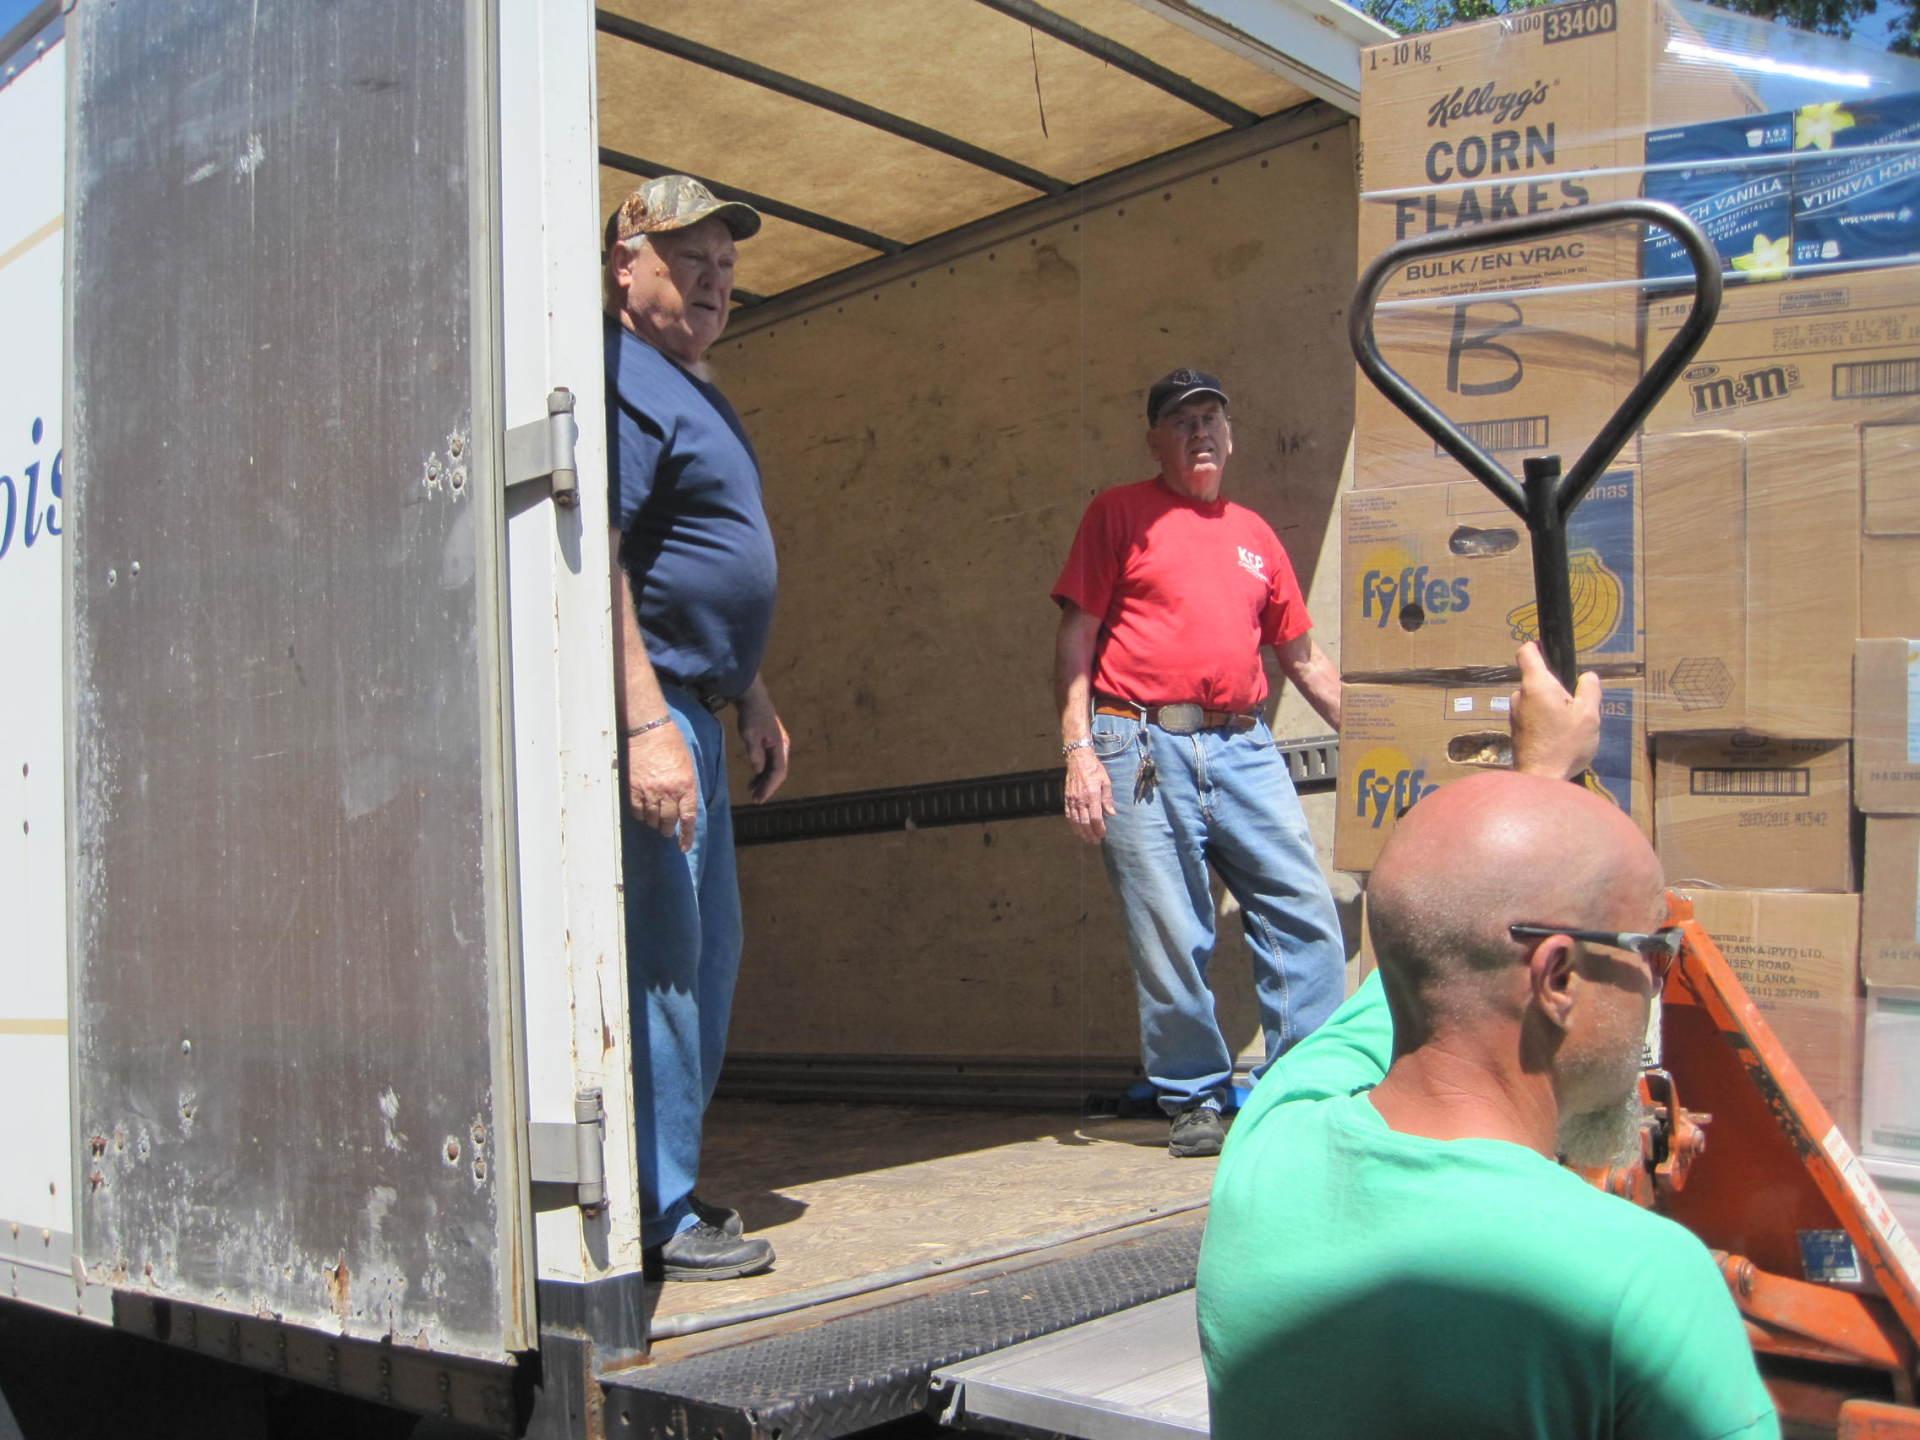 Food Delivery To Good Samaritan Inn